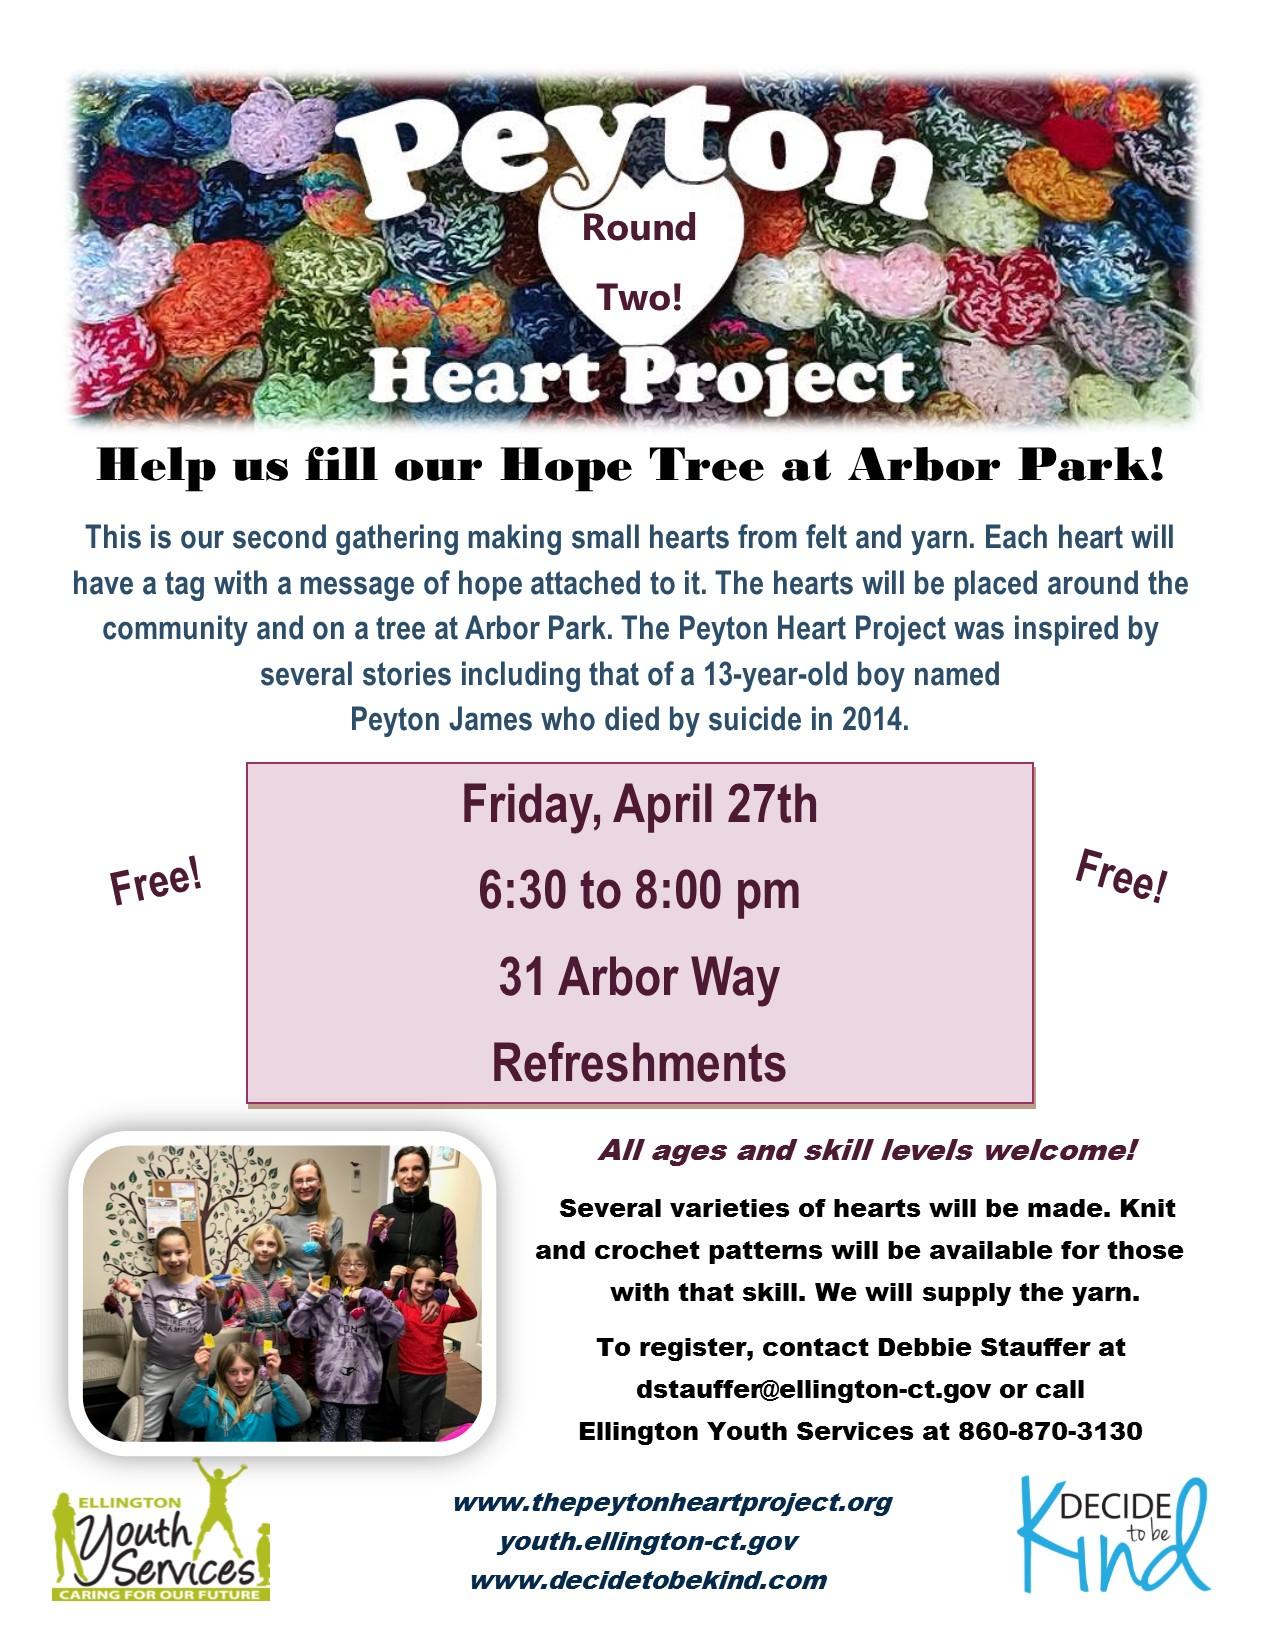 Peyton Heart Project Flyer 2nd Night.jpg